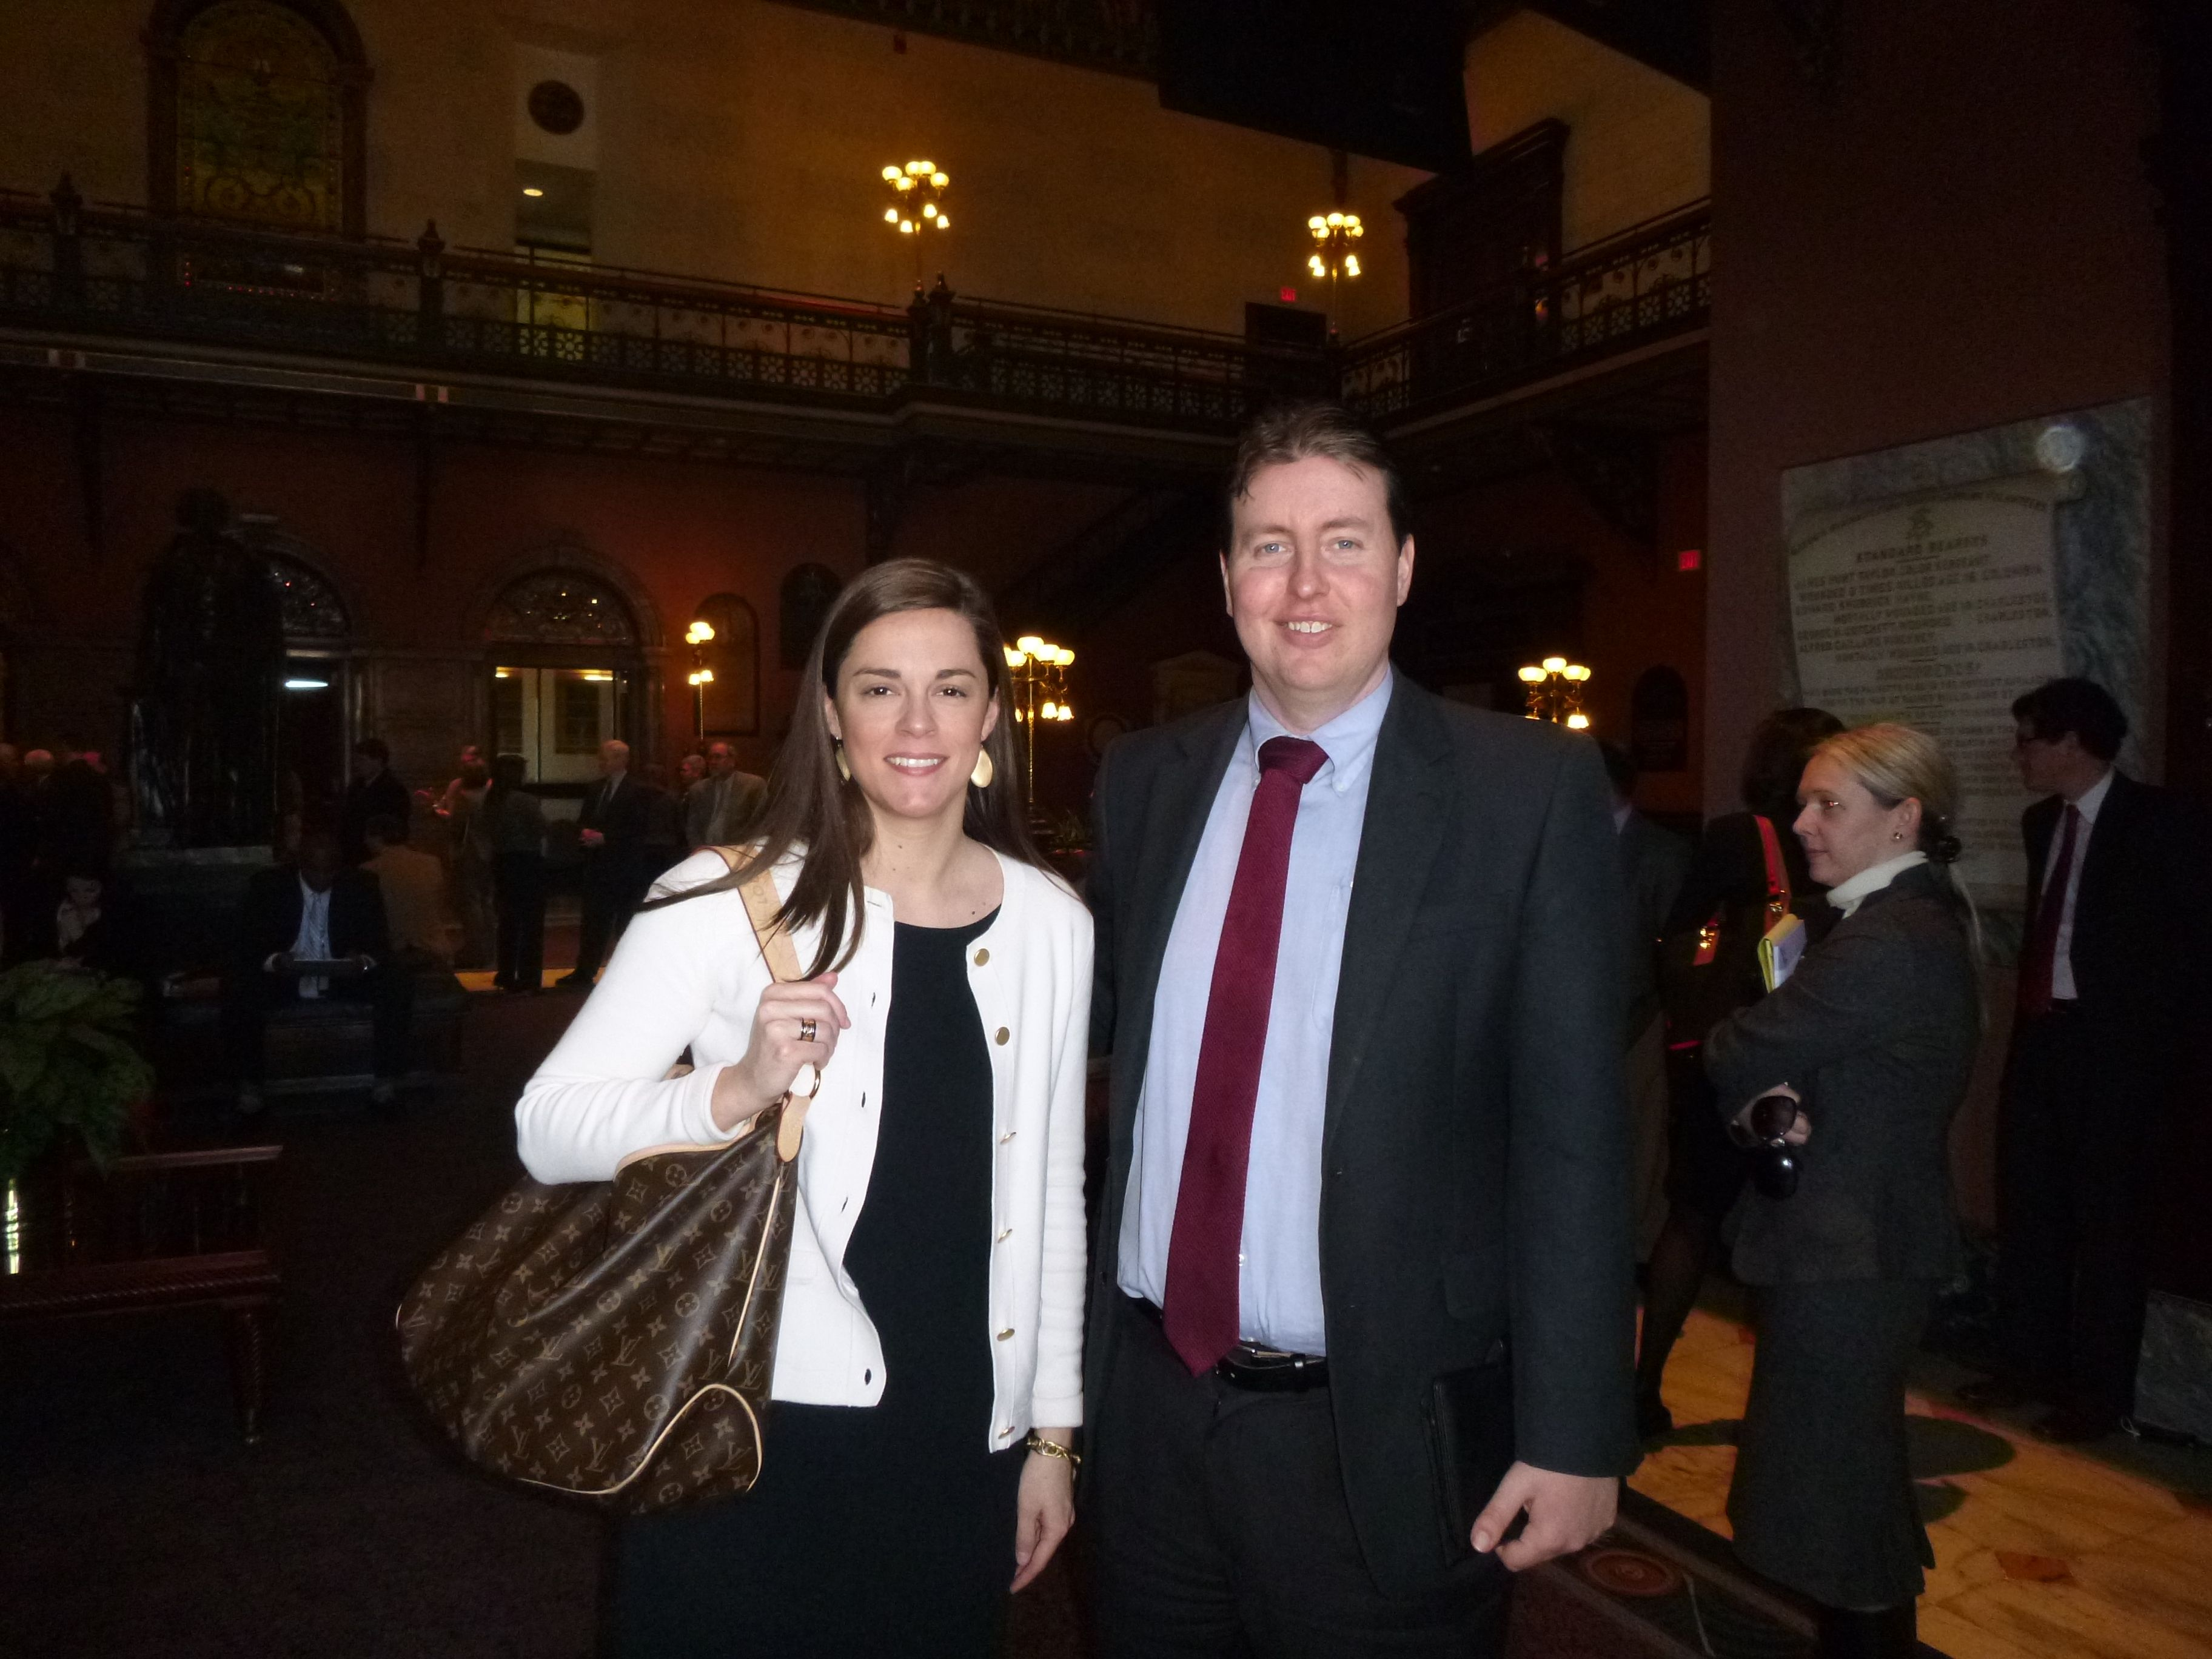 Danielle lewis attorney -  Attorney Evan Guthrie With Lee Ellen Bagley Of Gafney Lewis Edwards At The South Carolina